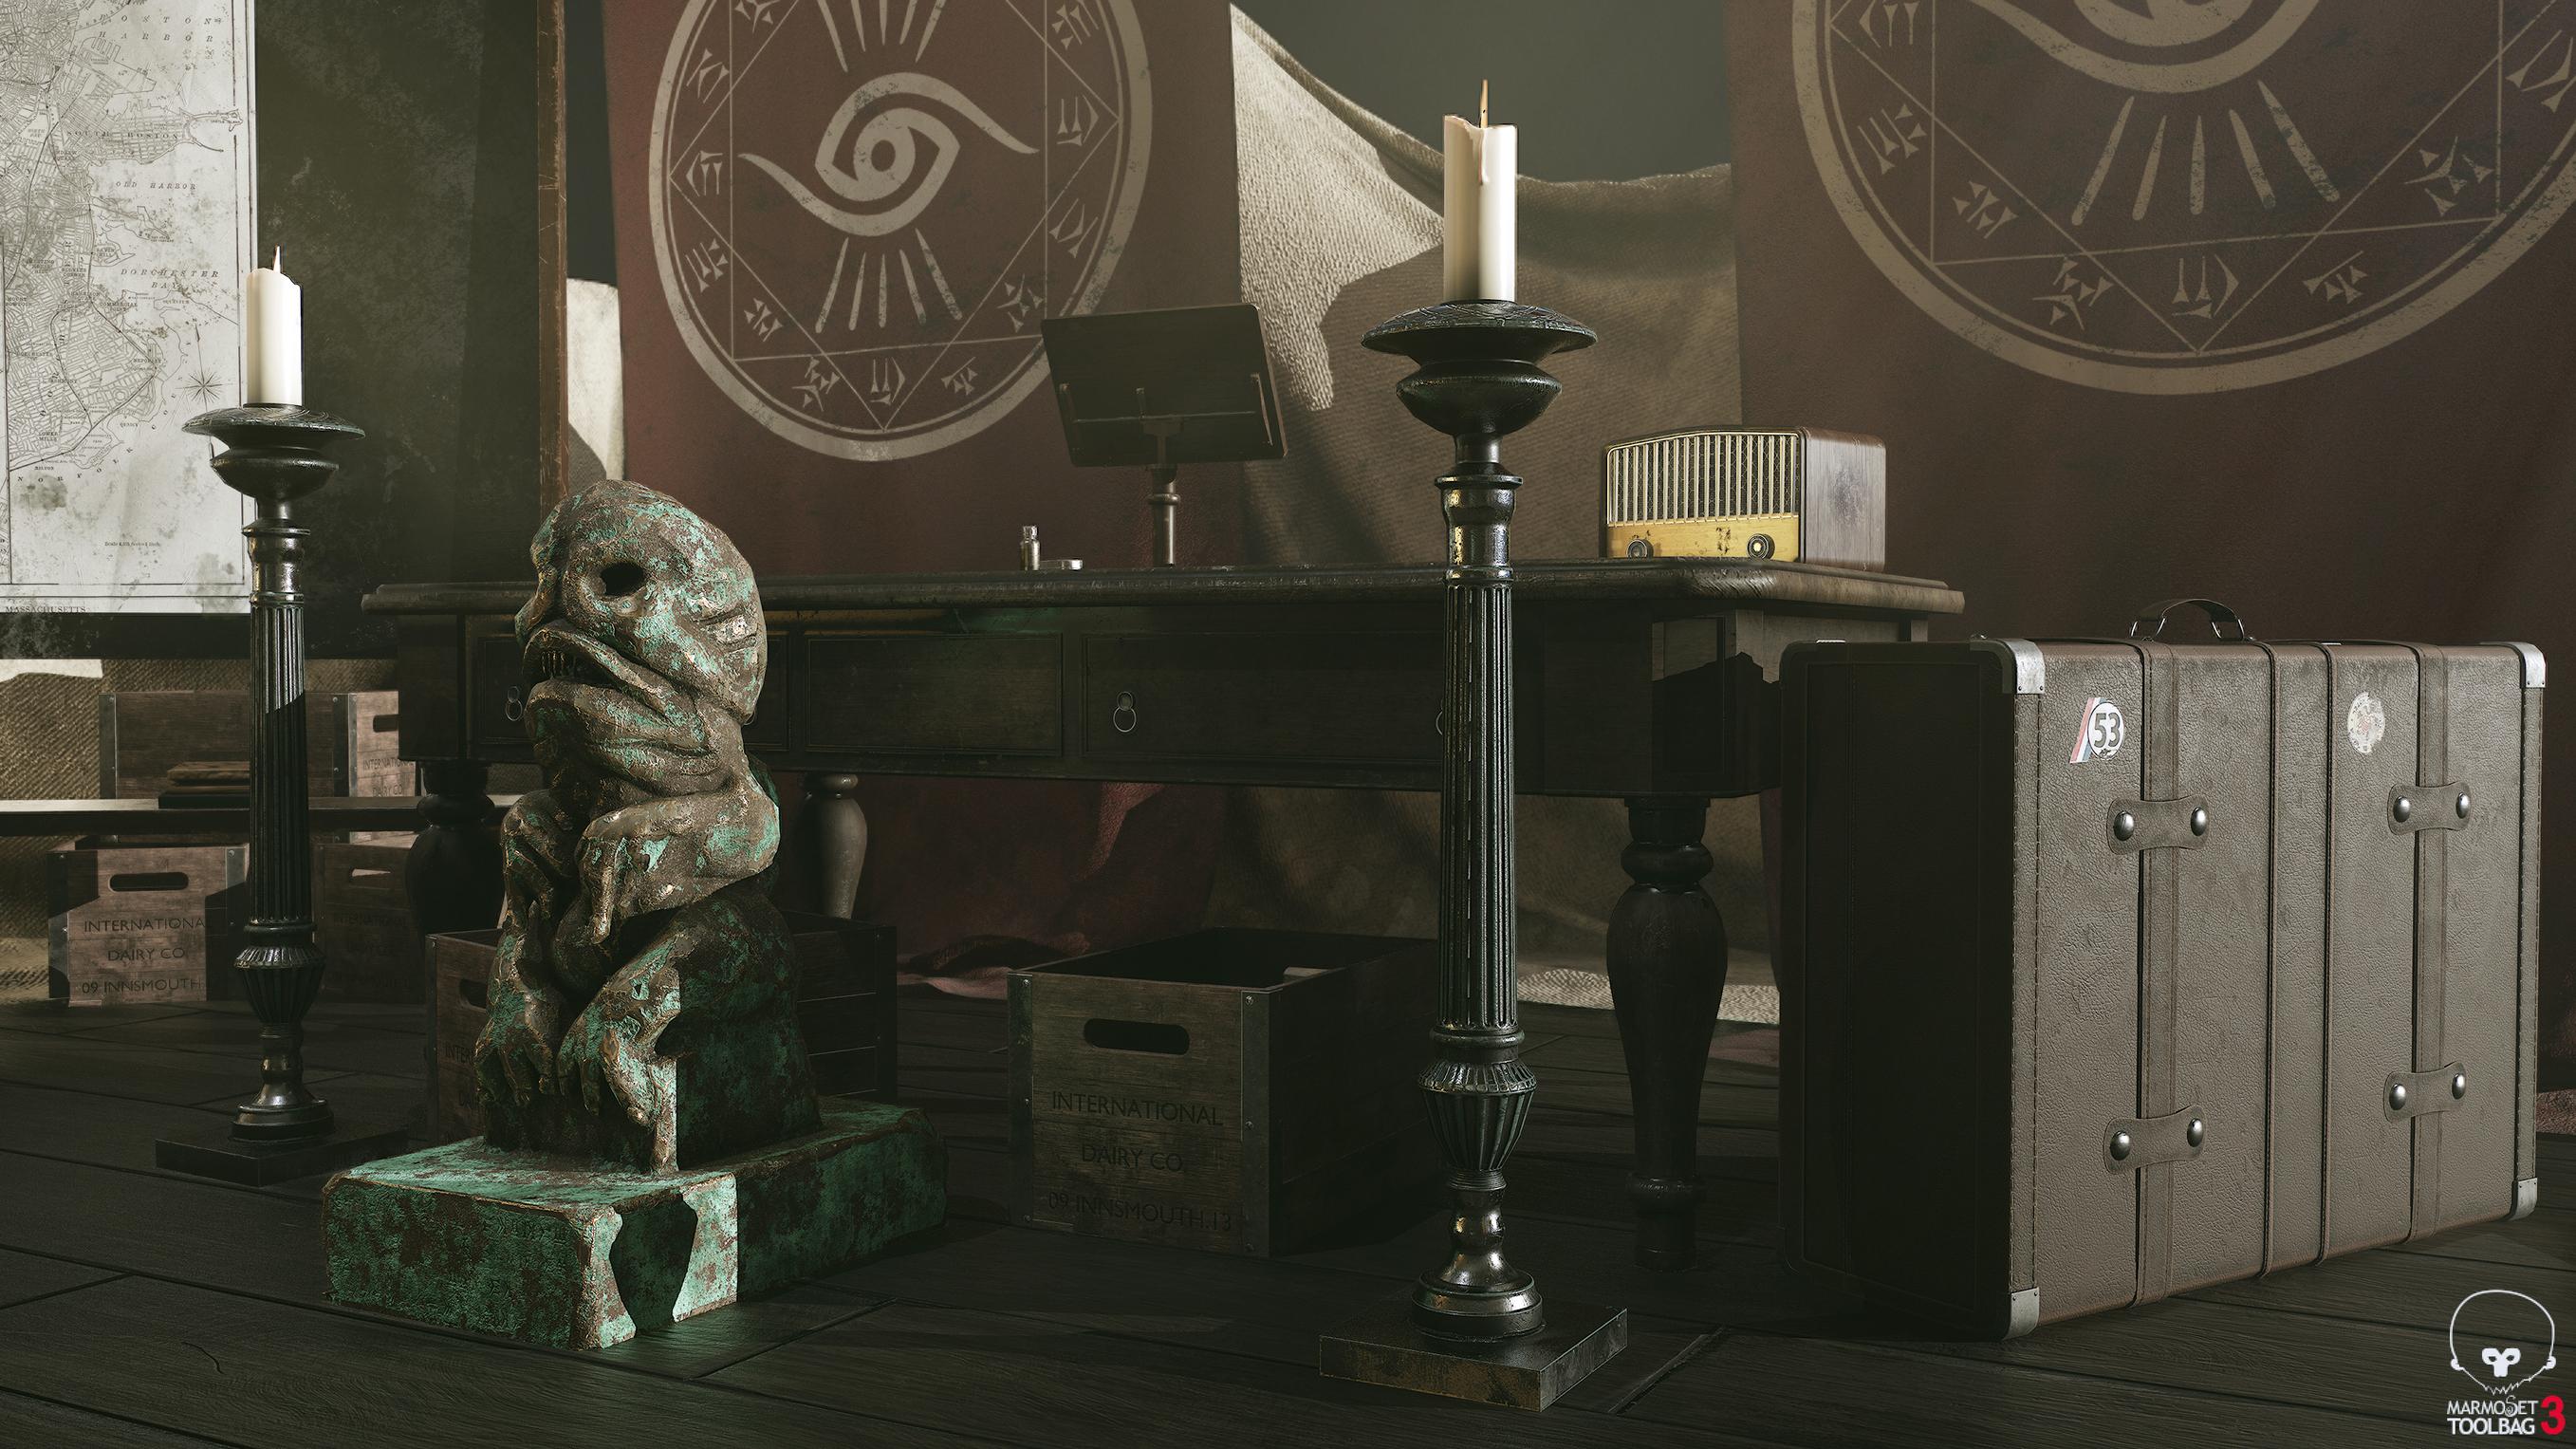 Game assets for UE4 scene (Esoteric order of dagon) - Works